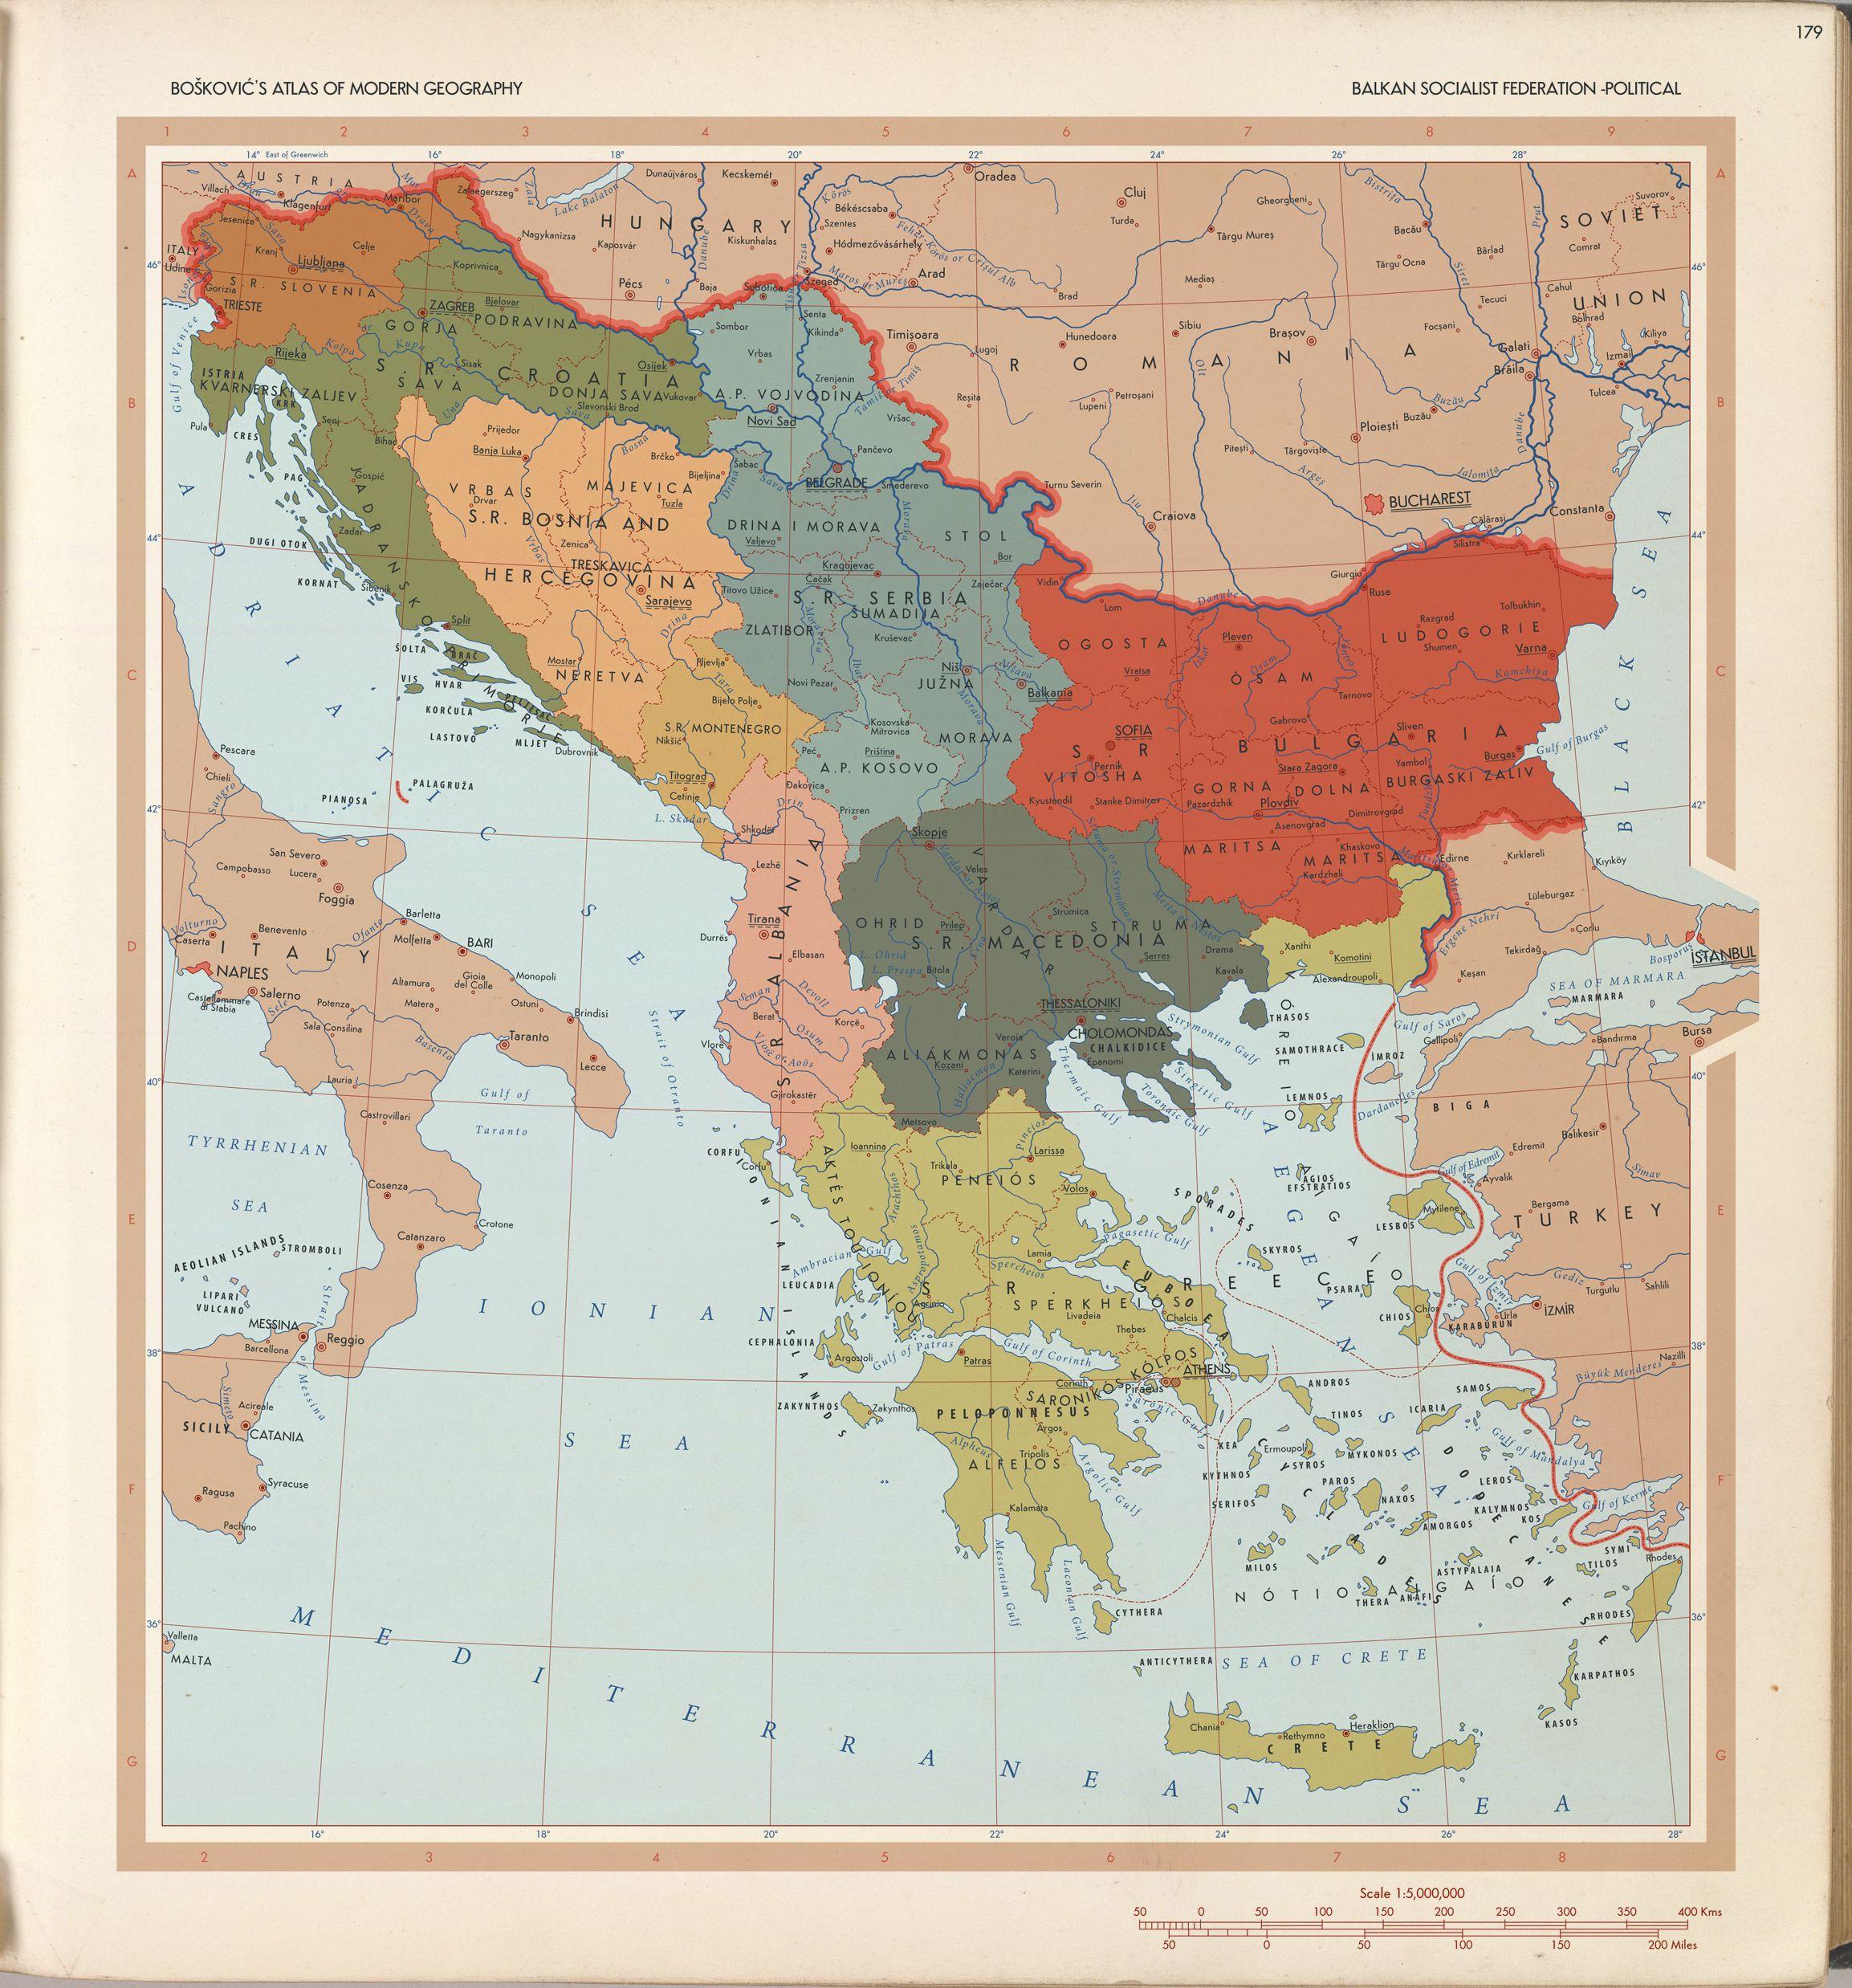 Balkan Socialist Federation 1964 Map Imaginary Maps Balkan